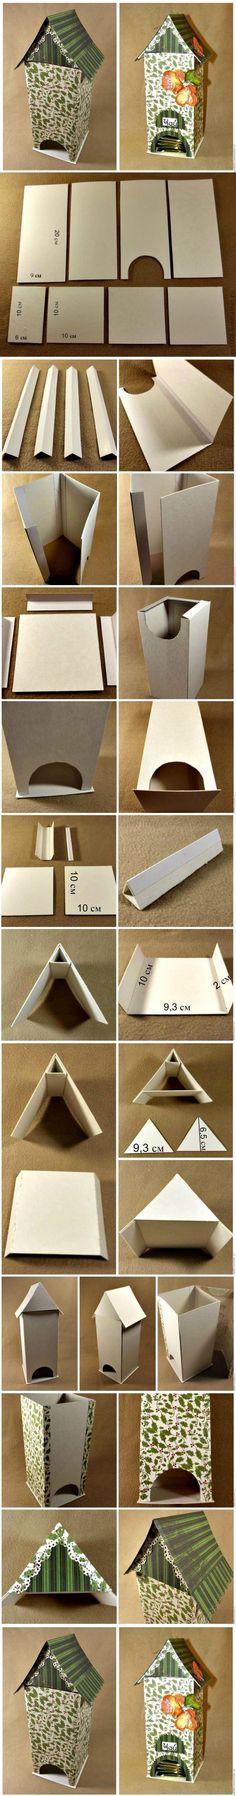 diy, cardboard, tea, bag, dispenser